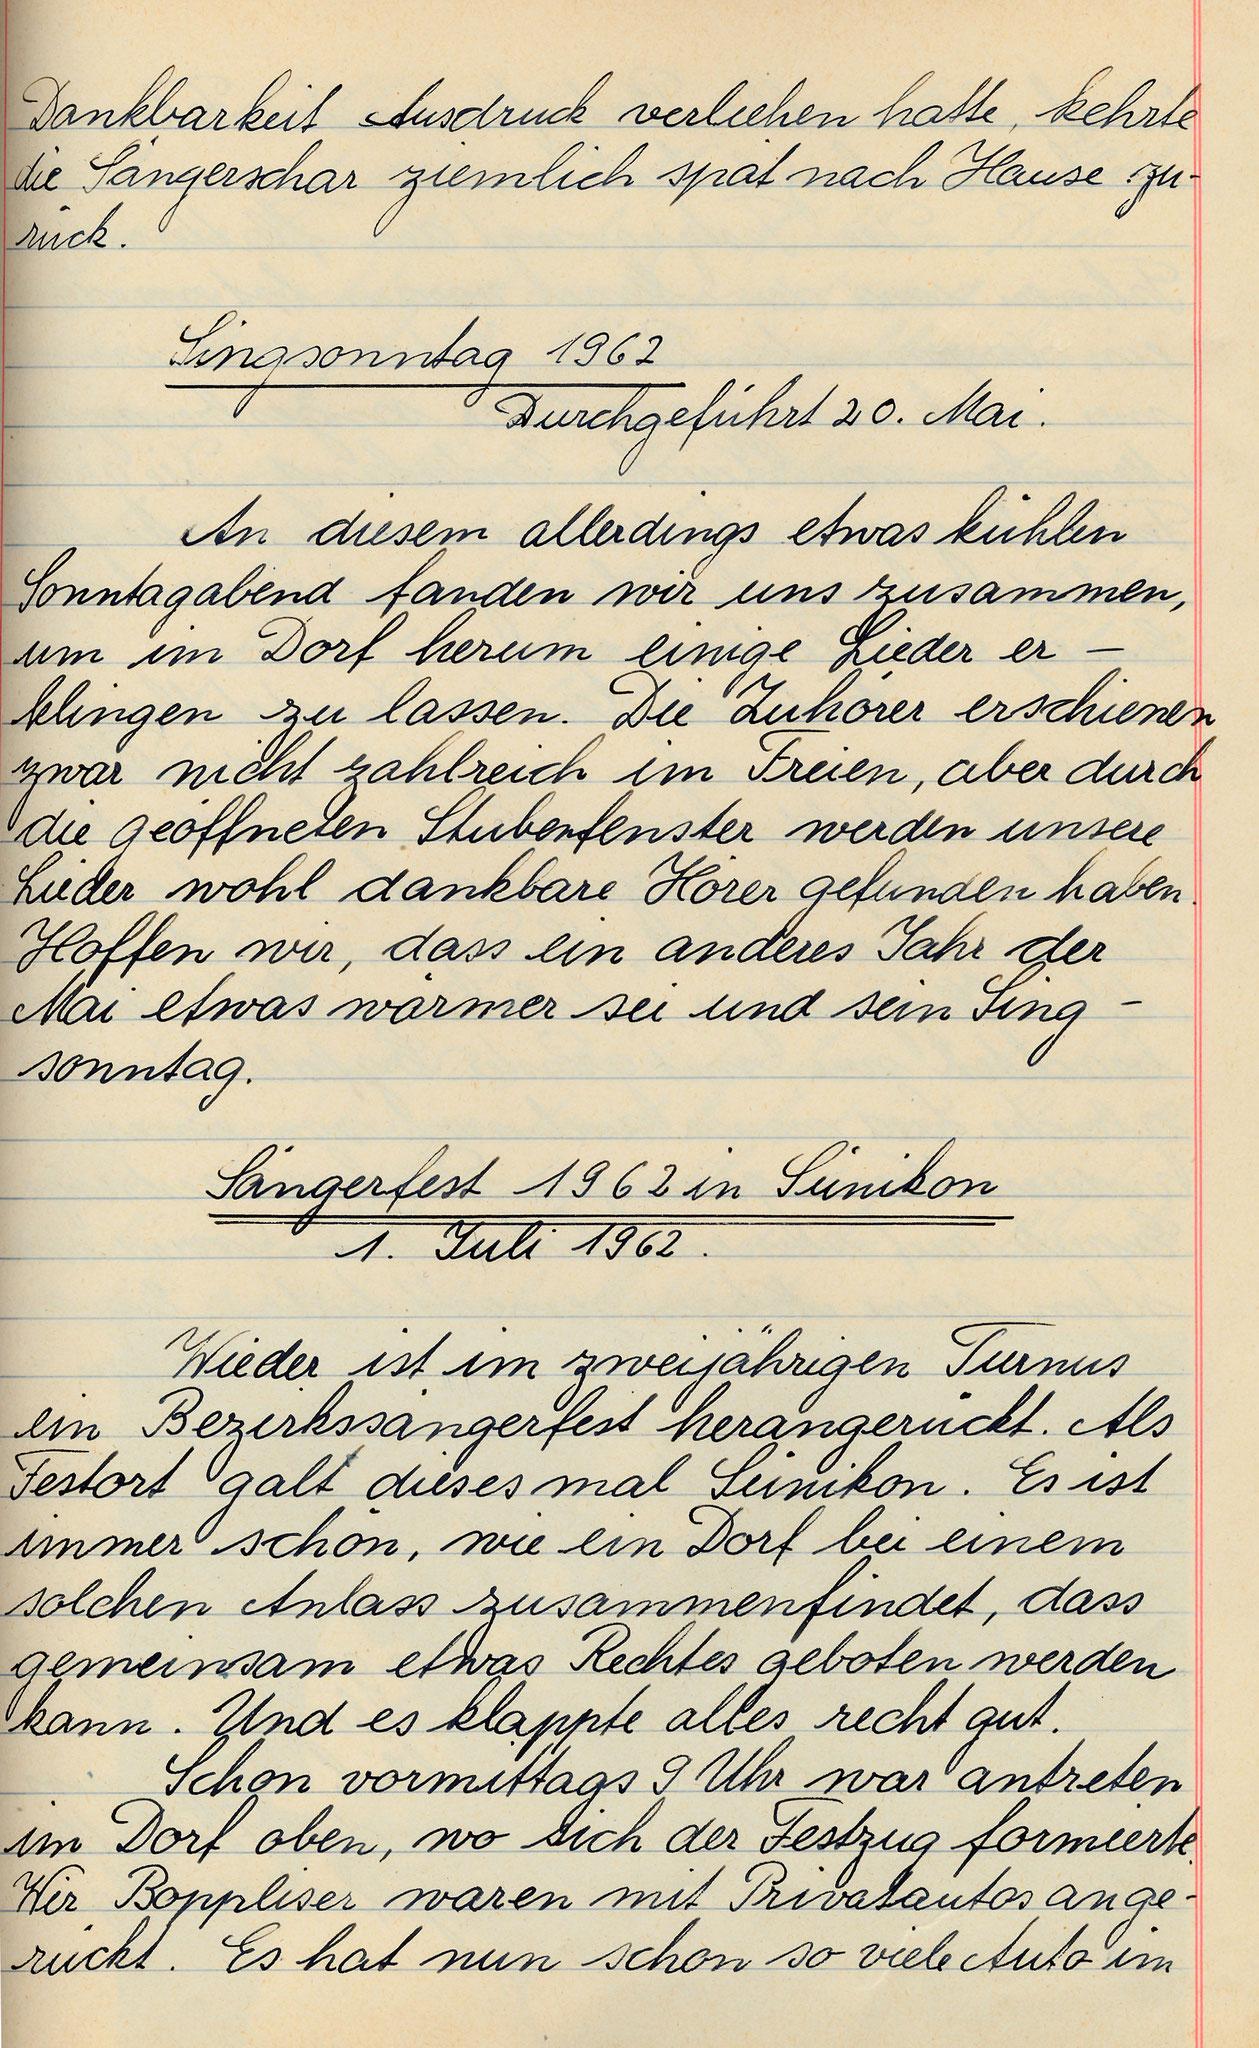 Protokolleintrag zum Sängertag Sünikon vom 1.Juli 1962